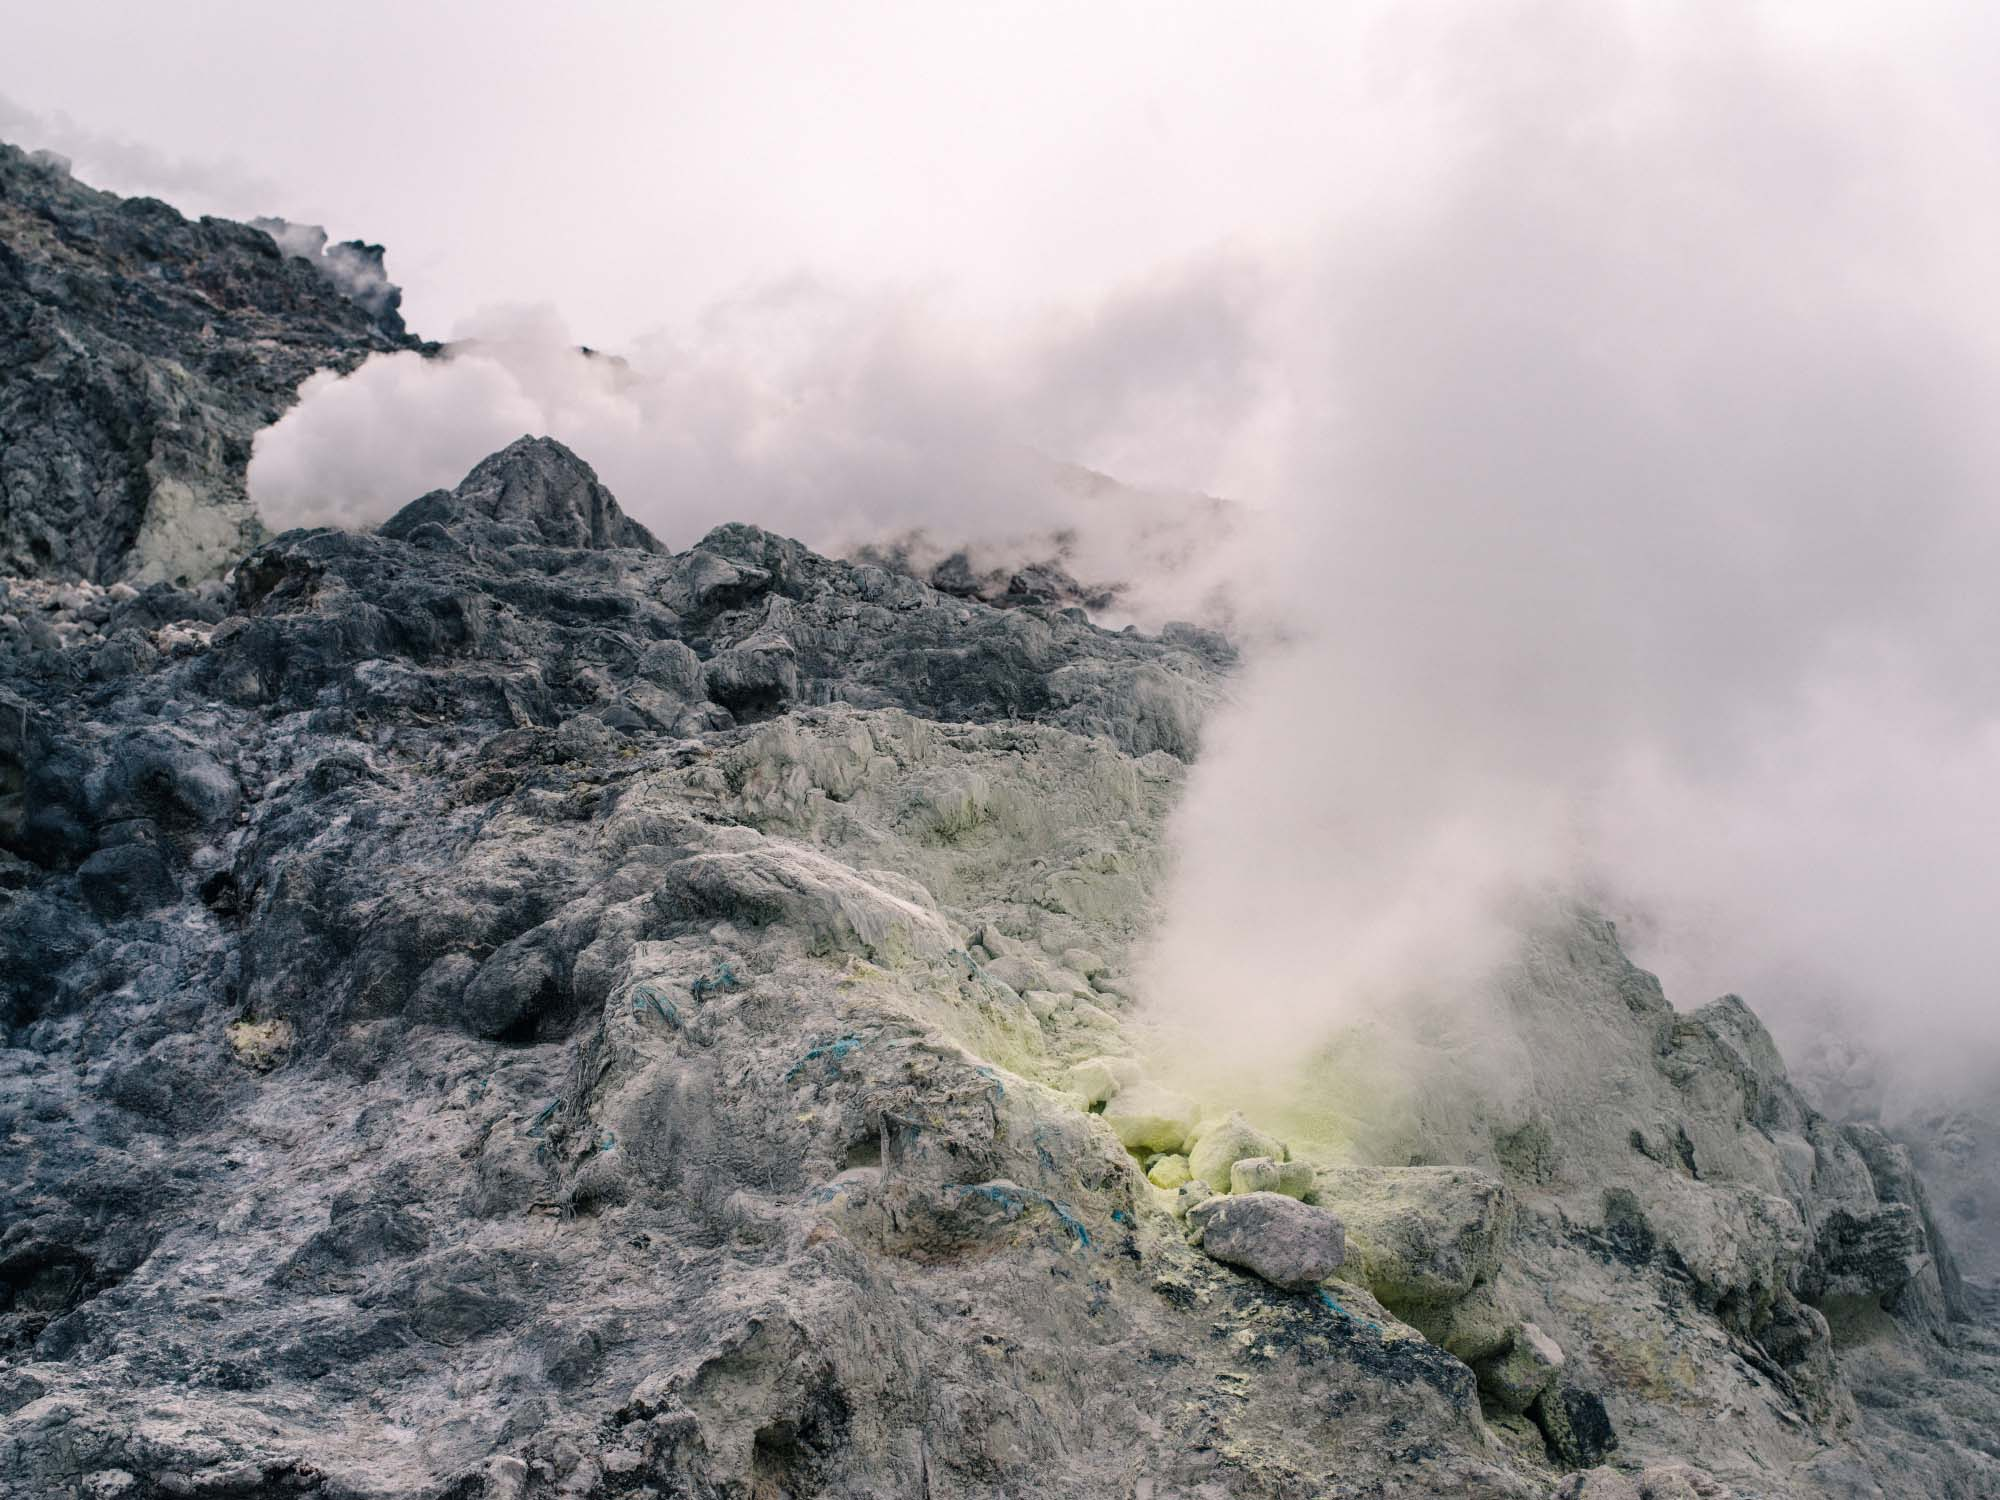 hike-mount-sibayak-steam-vents-02.jpg